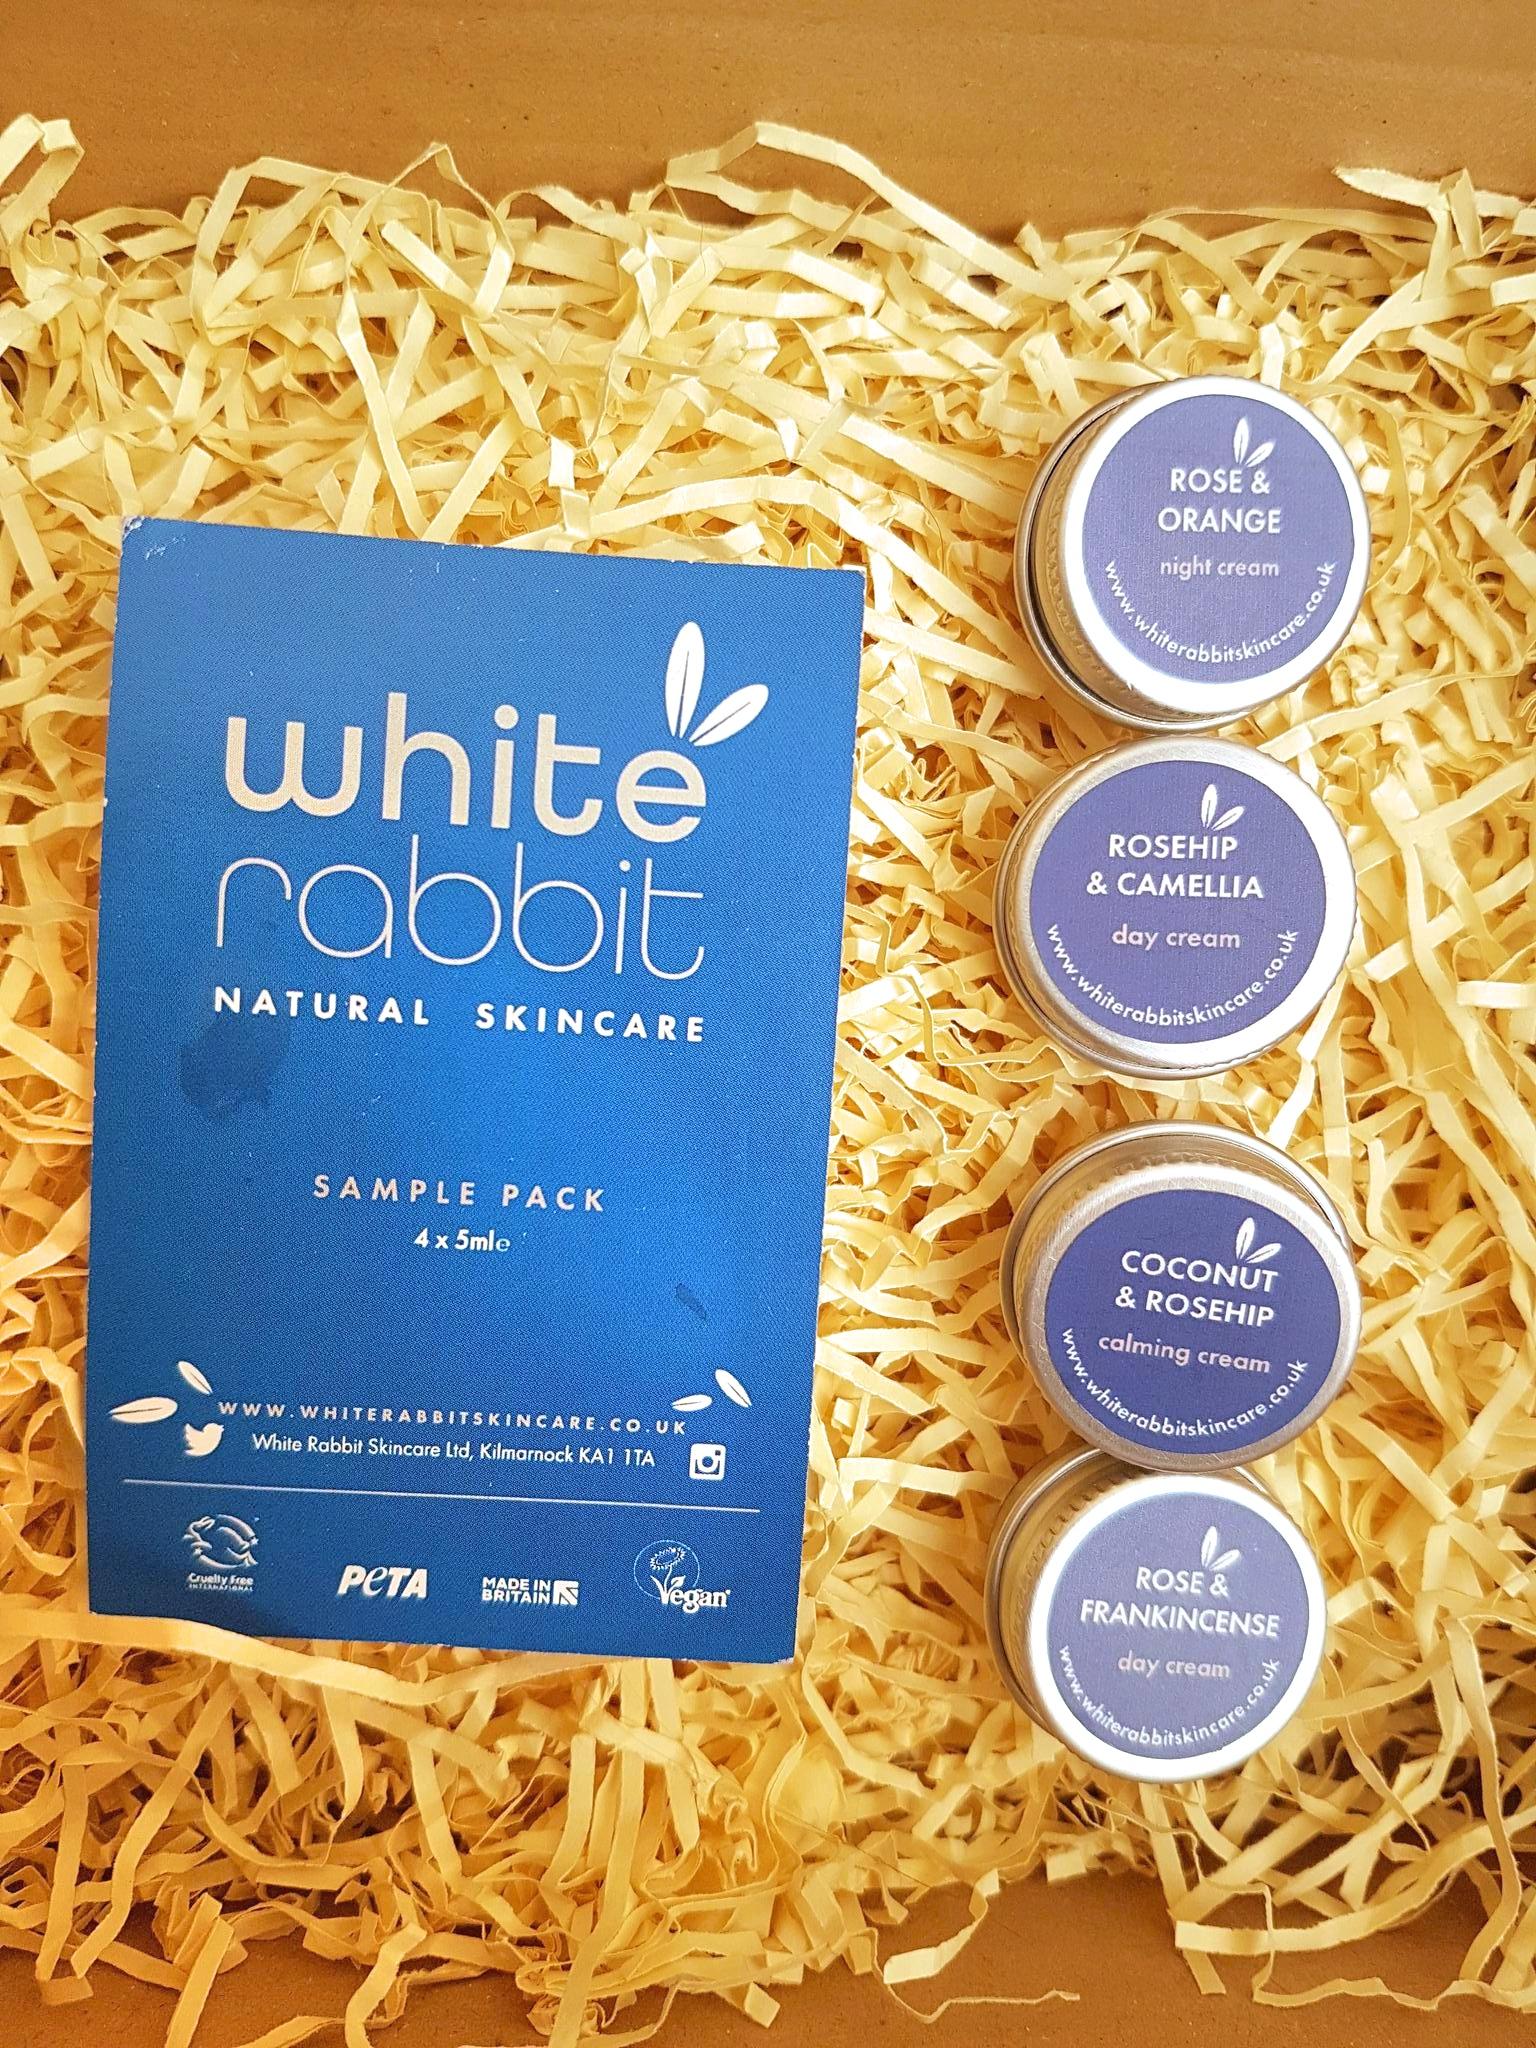 White Rabbit skincare plastic free sample set lying on yellow paper grass